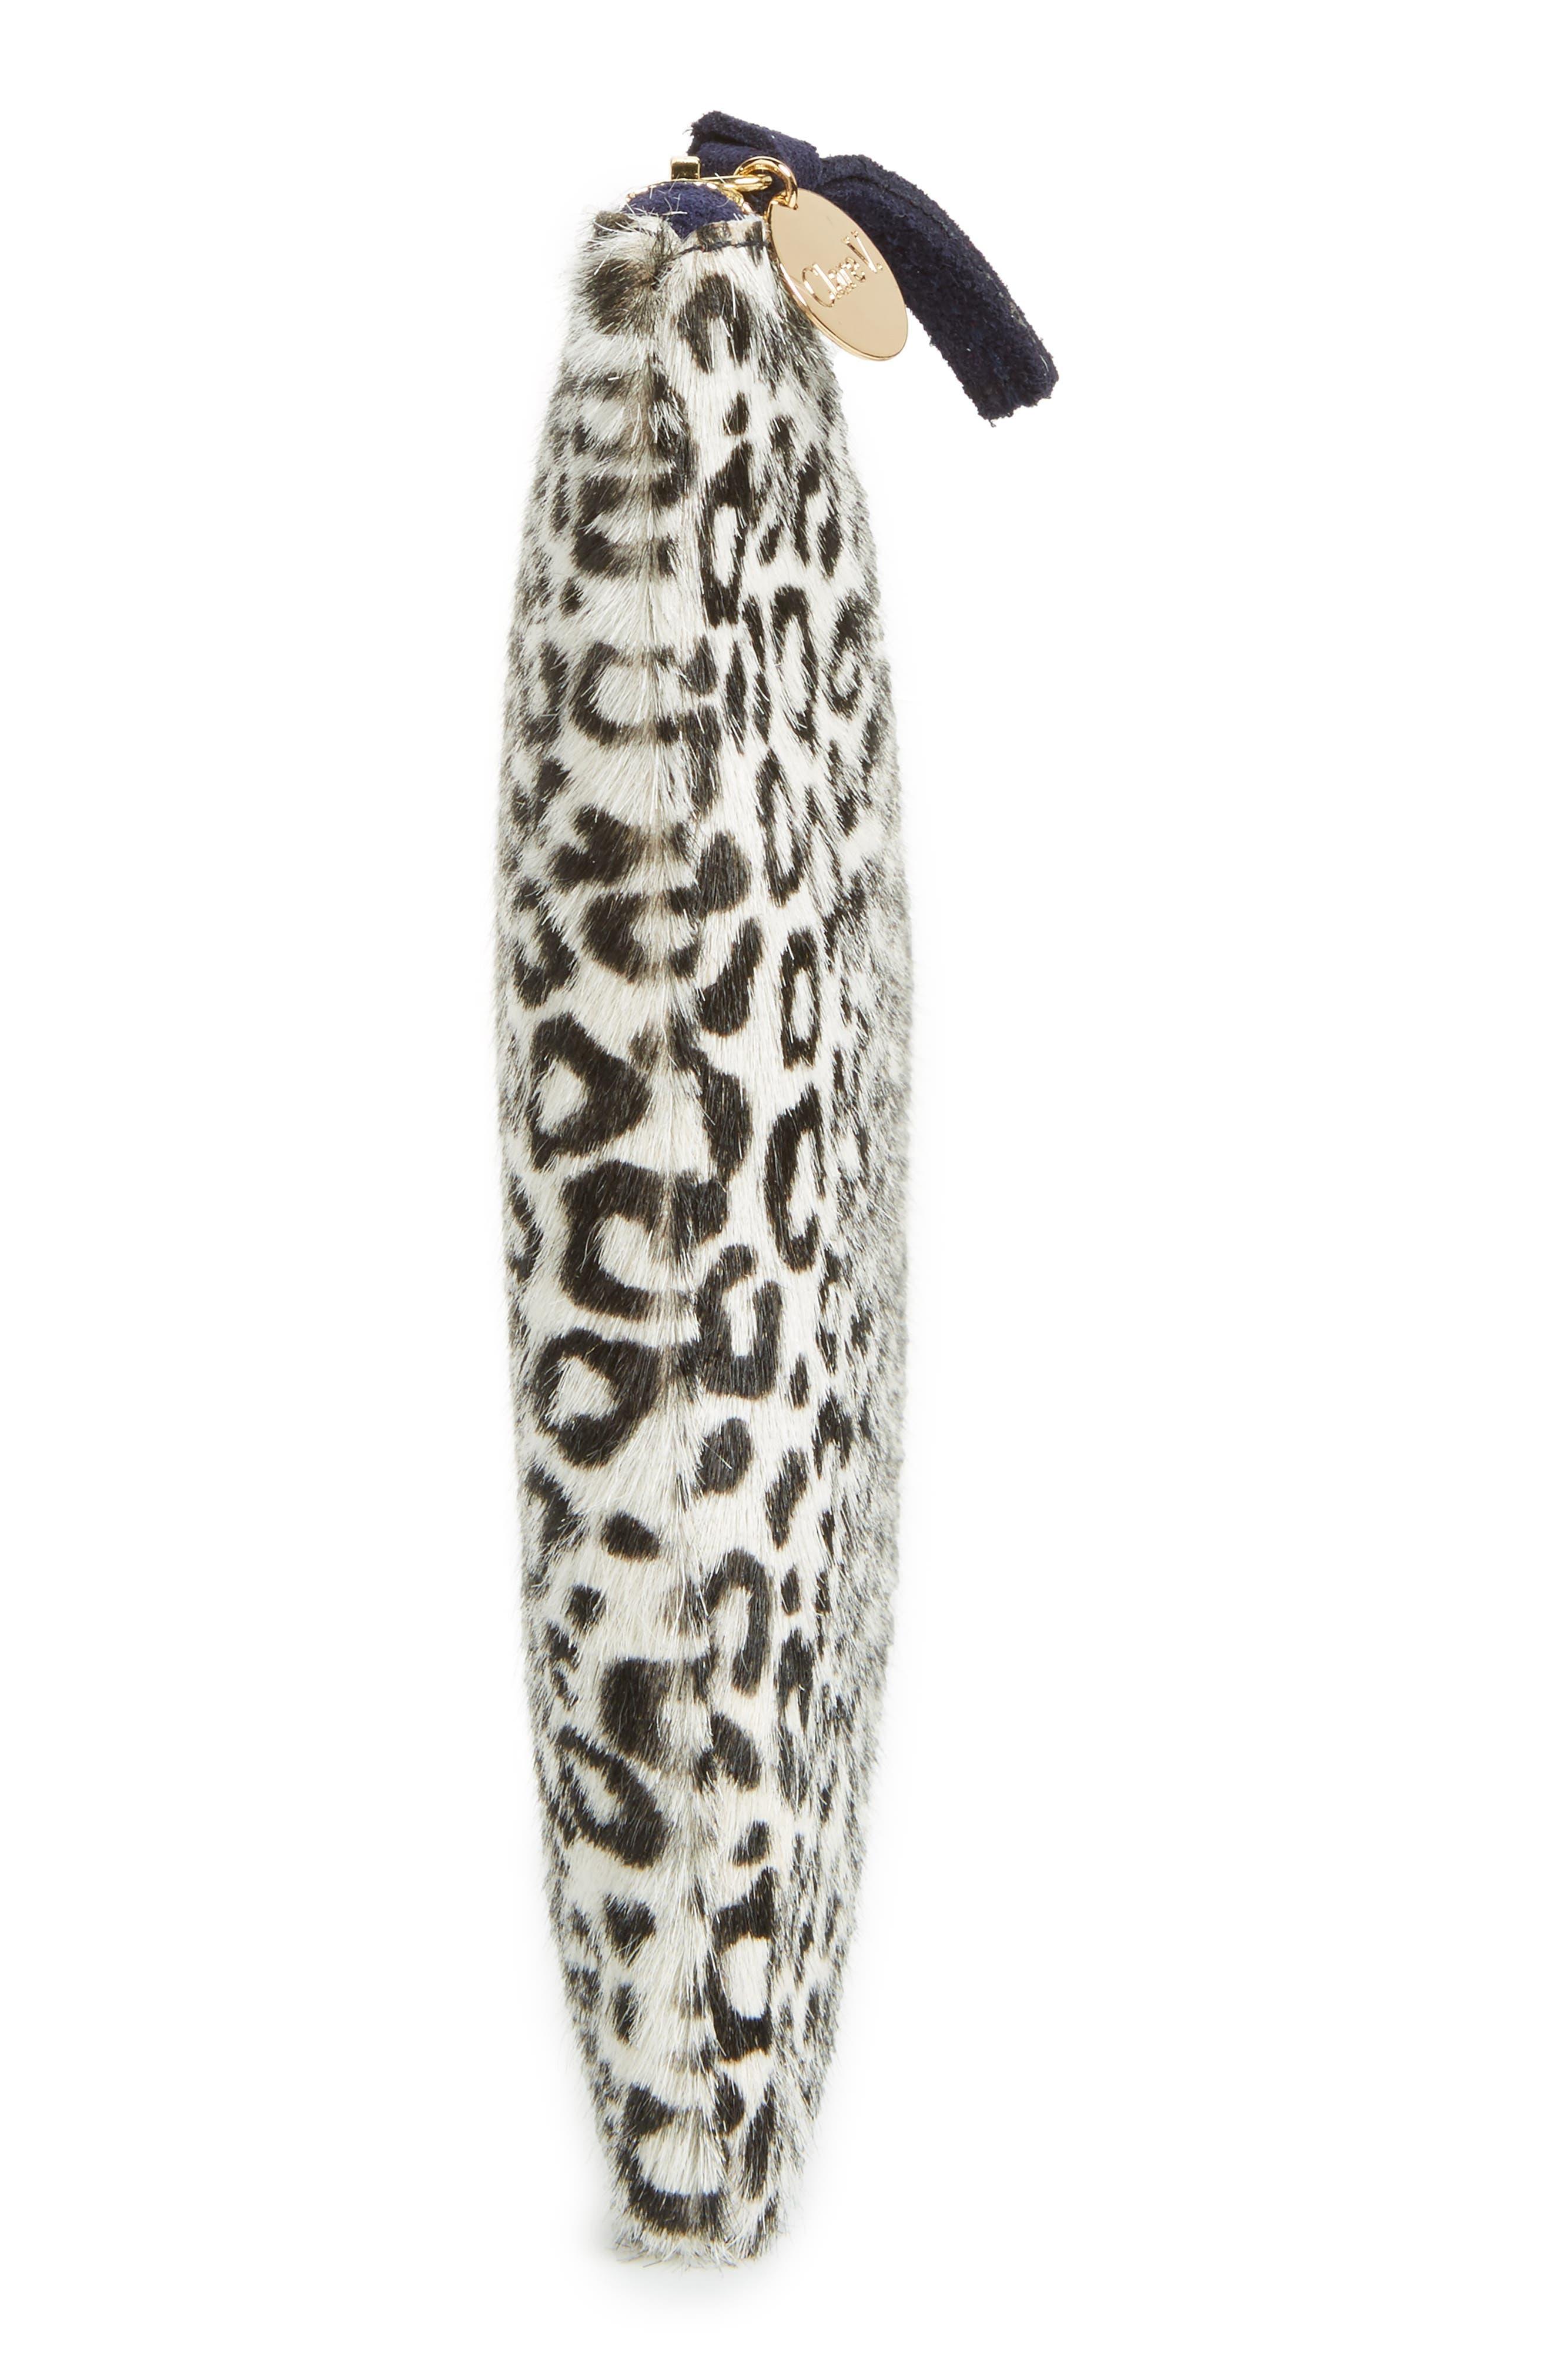 Star Ocelot Print Genuine Calf Hair Flat Clutch,                             Alternate thumbnail 5, color,                             Mini Ocelot Hair-On